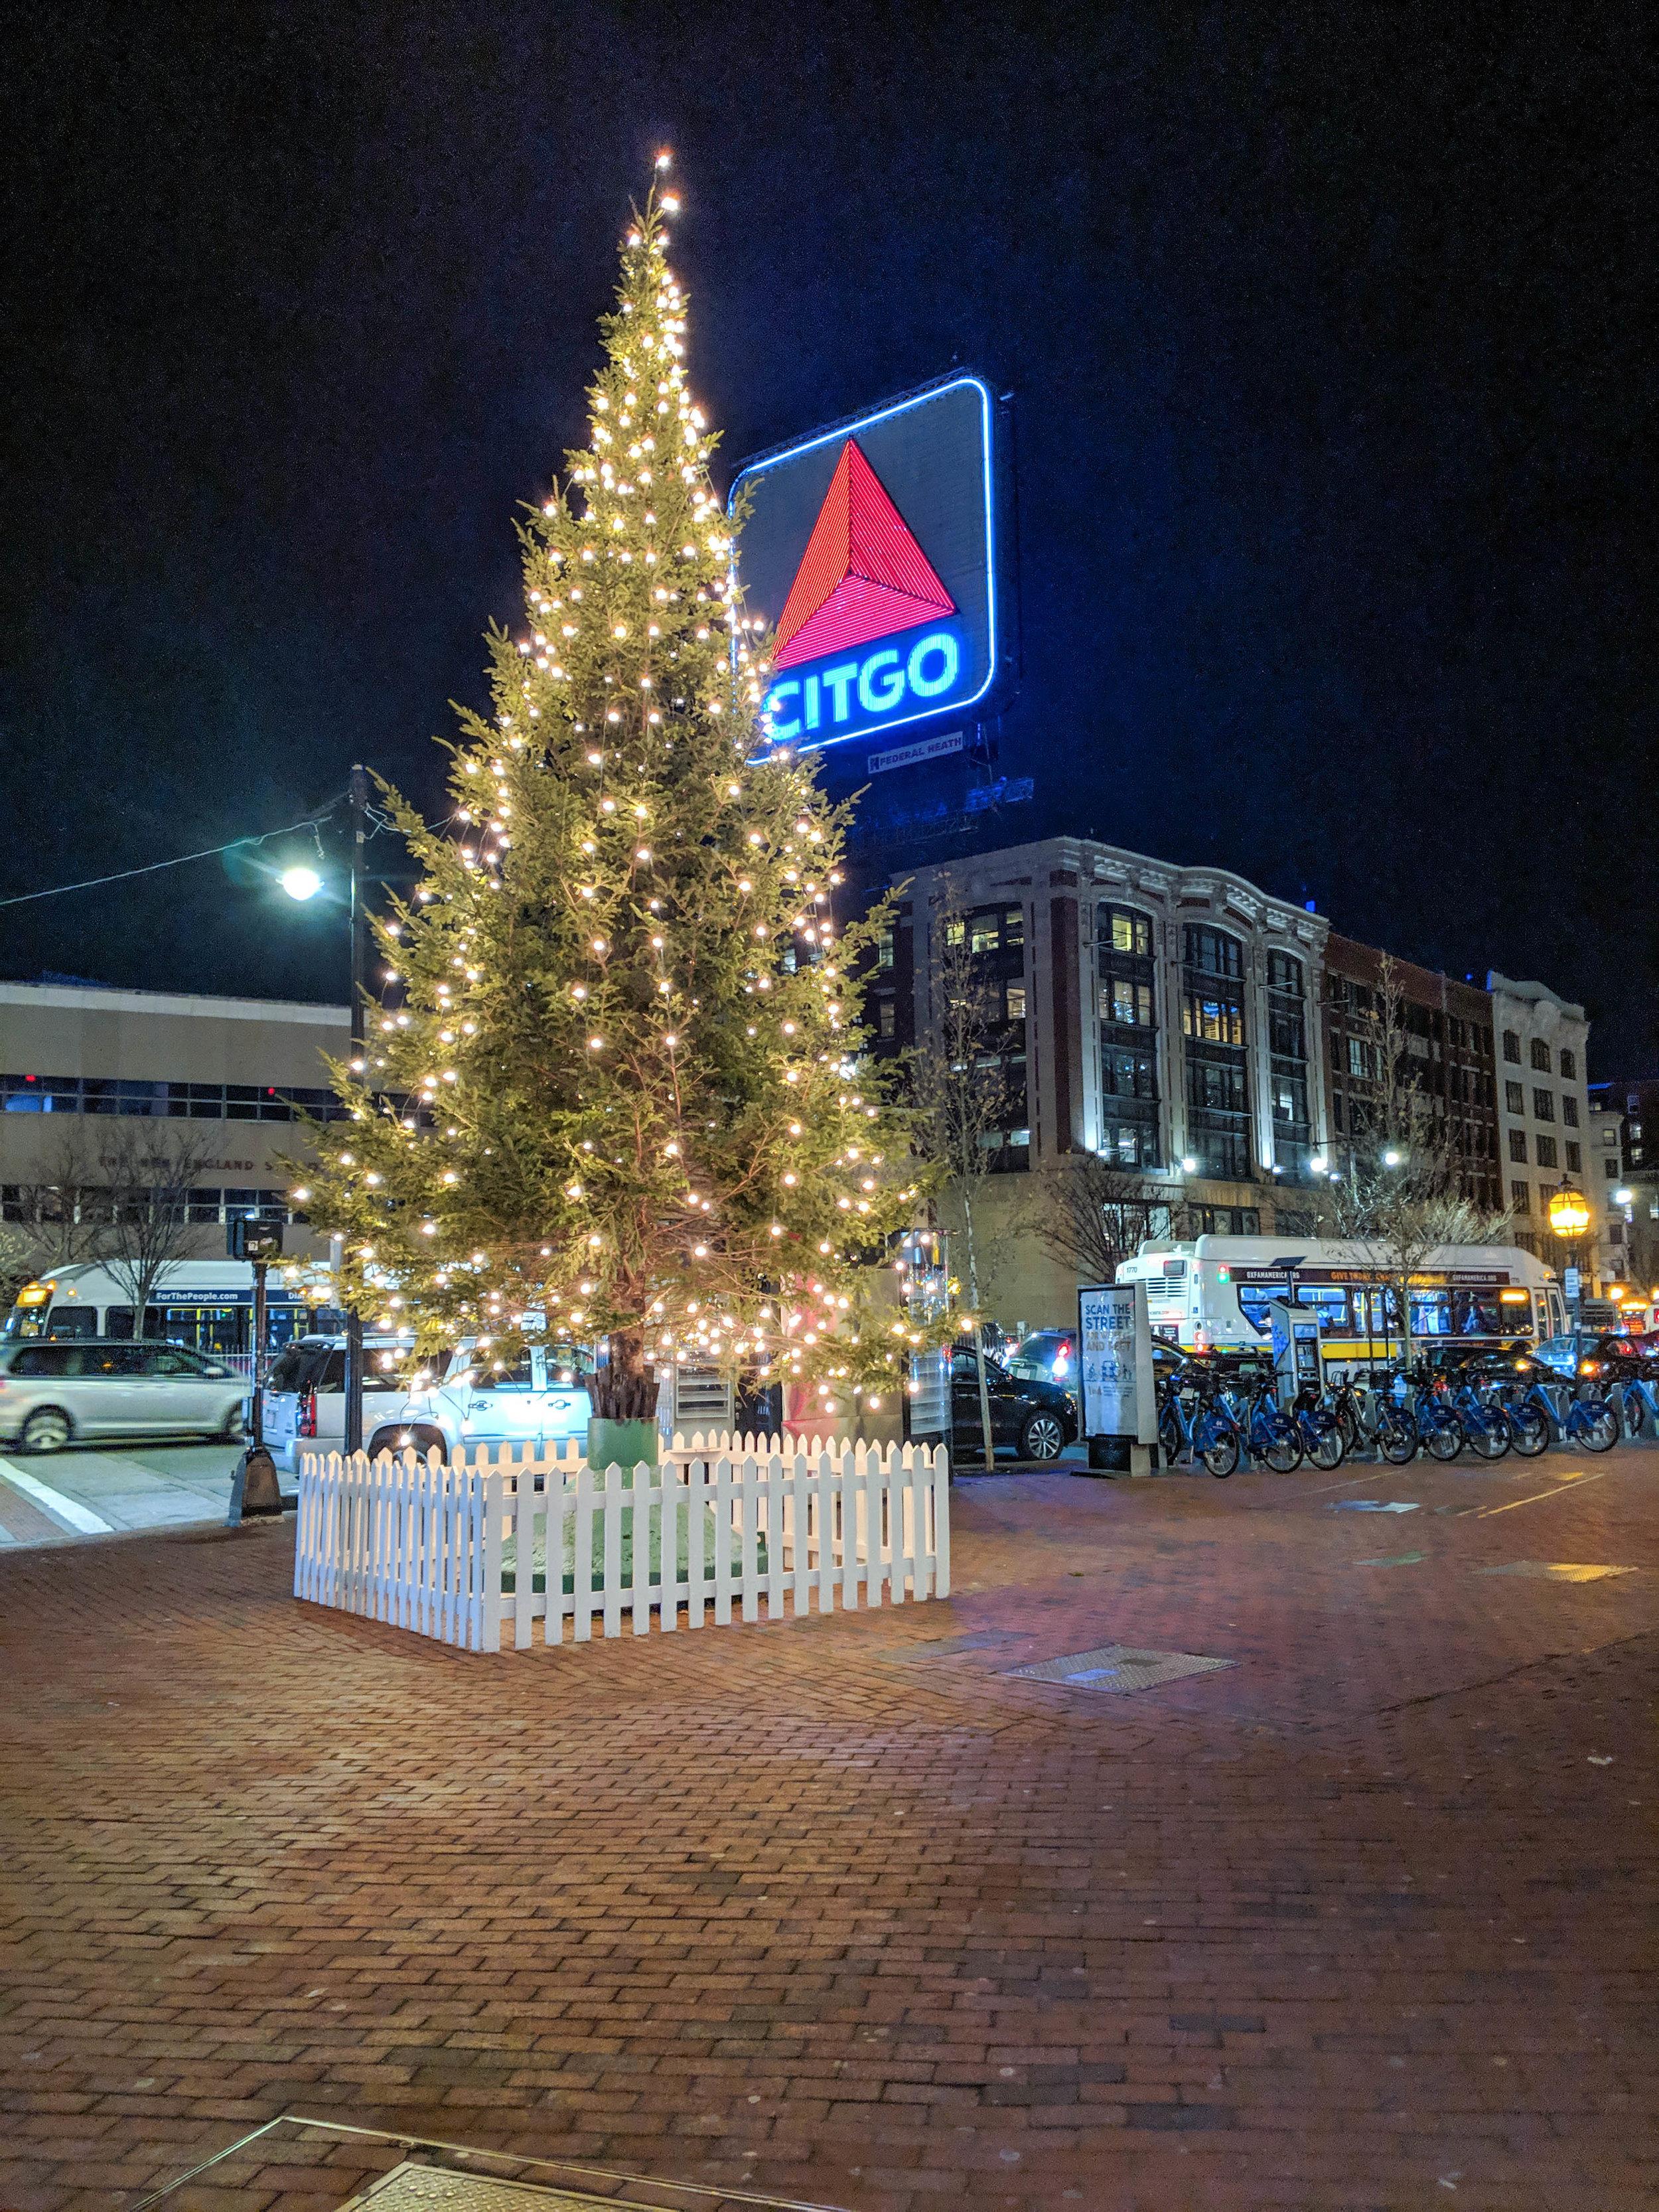 bri rinehart; boston; photography; Christmas; fenway; citgo sign